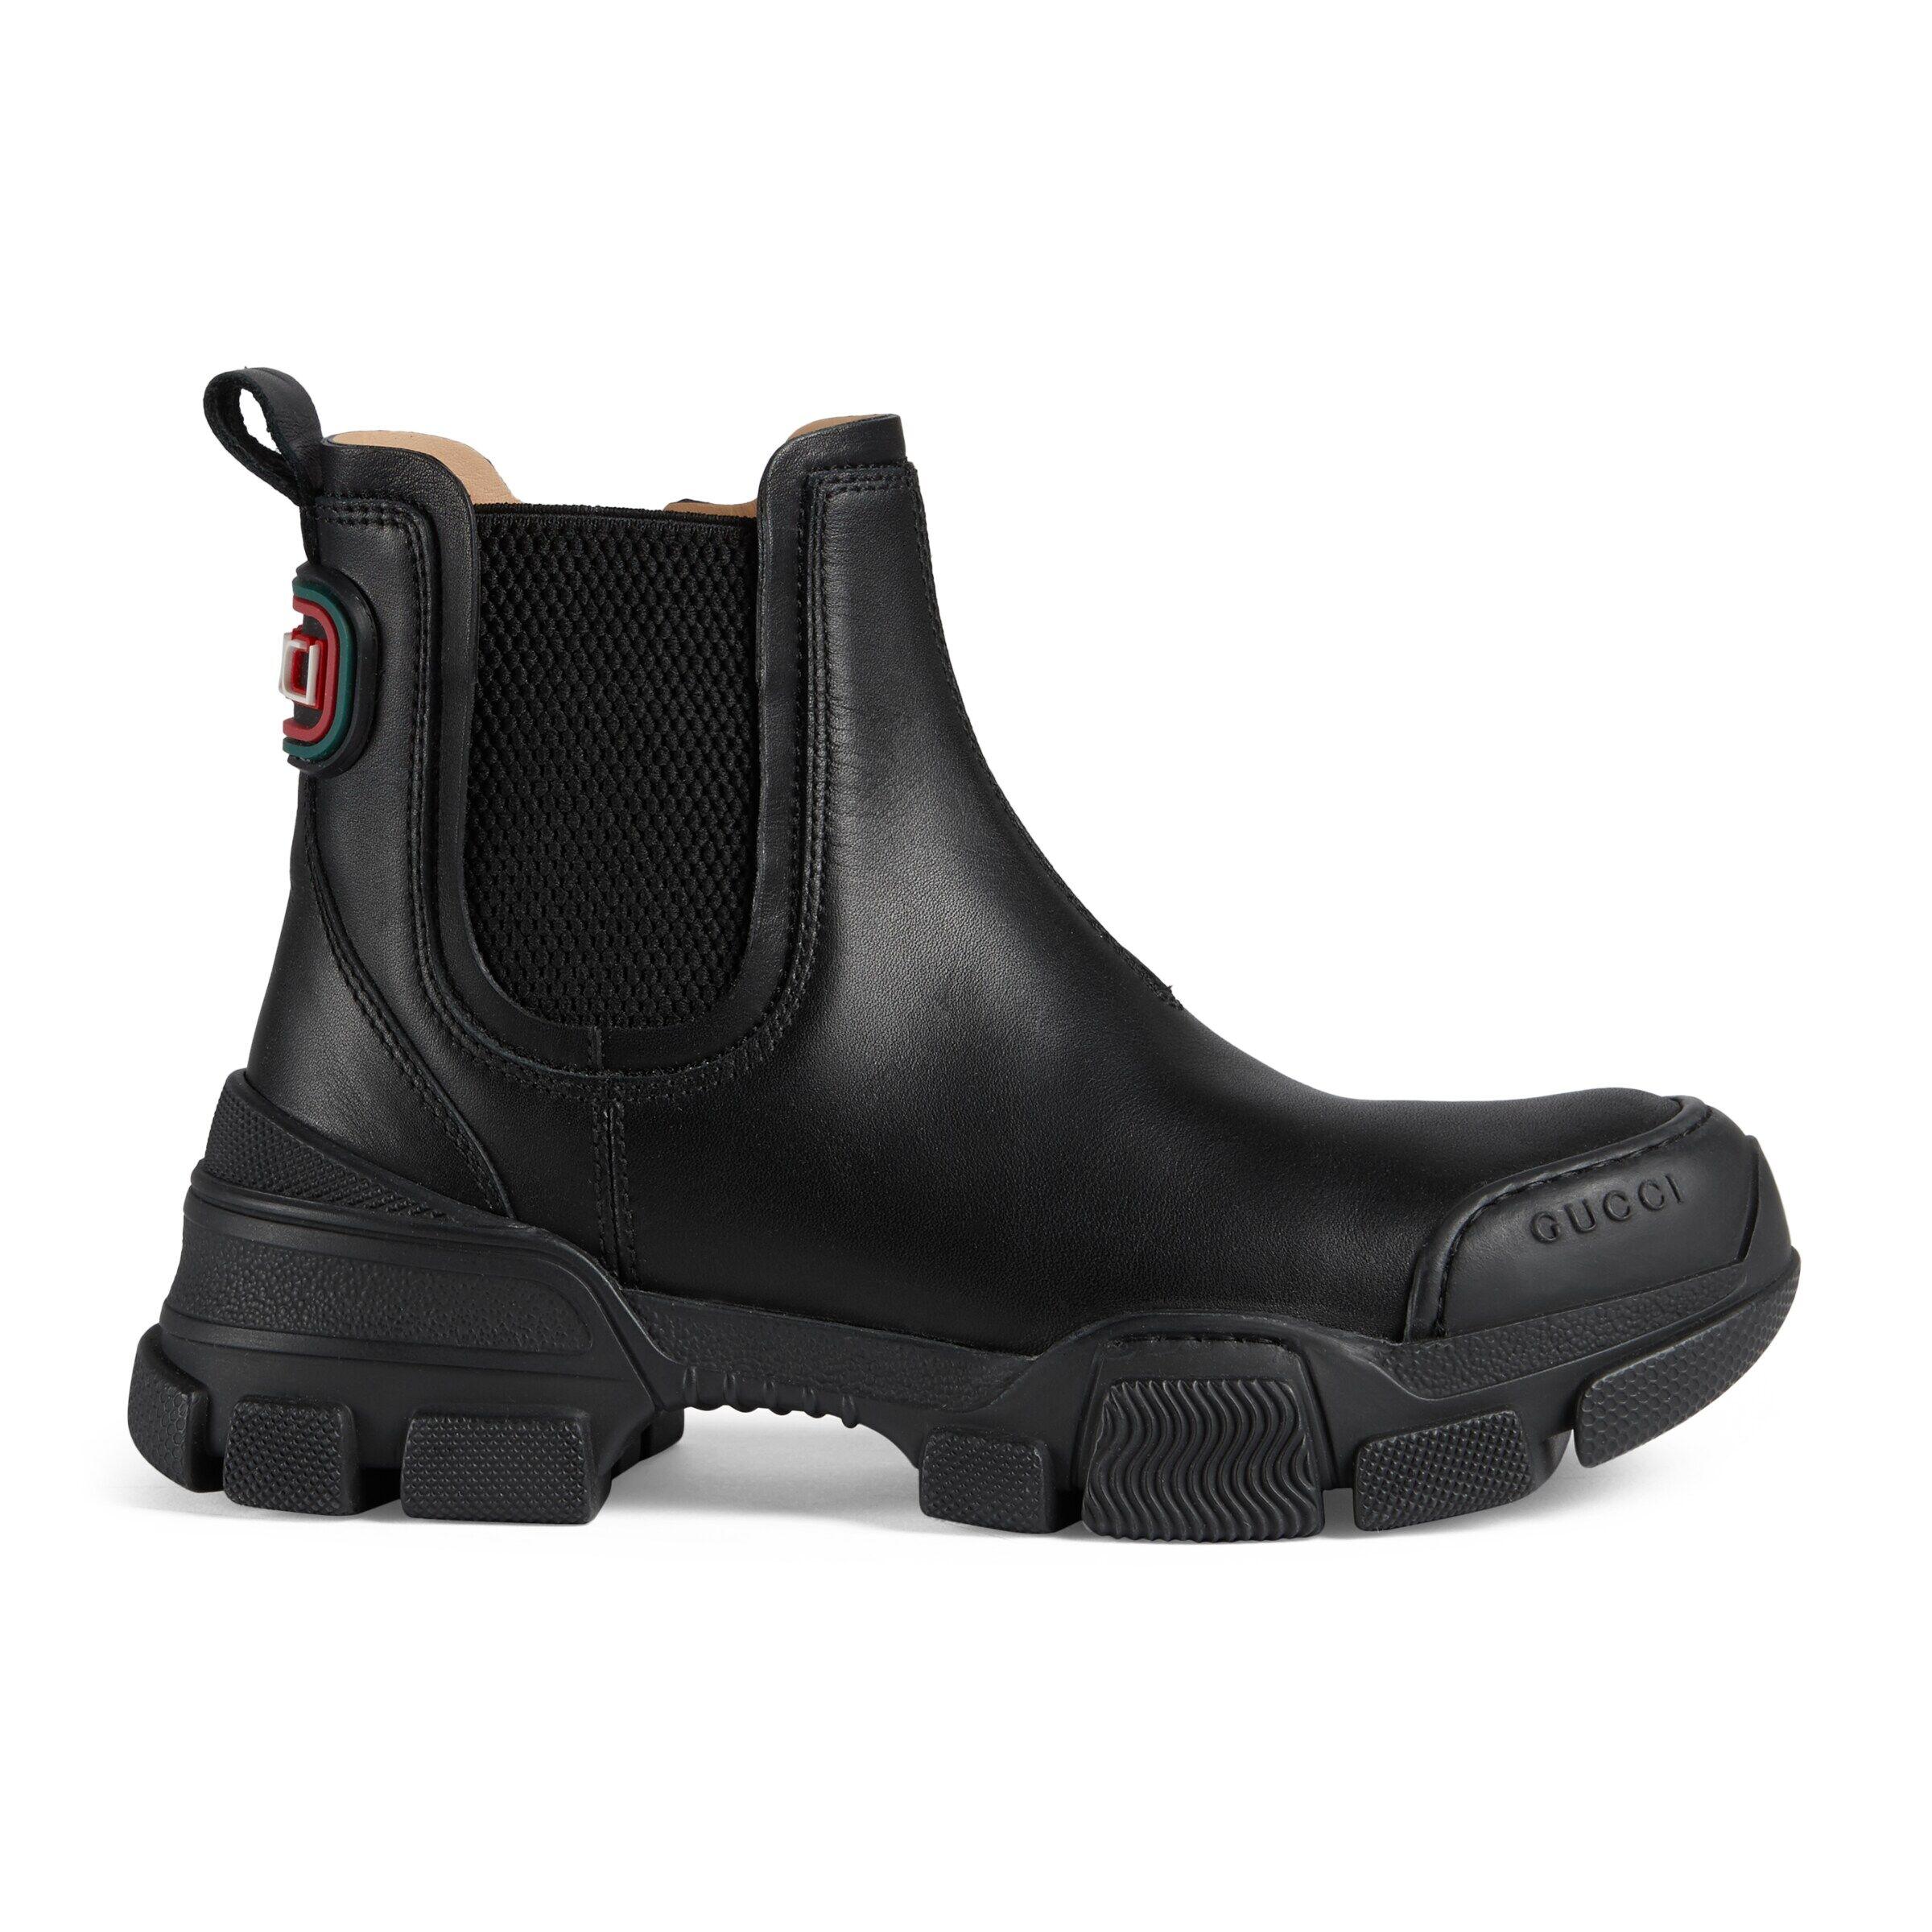 Gucci Children's ankle boot  - Black